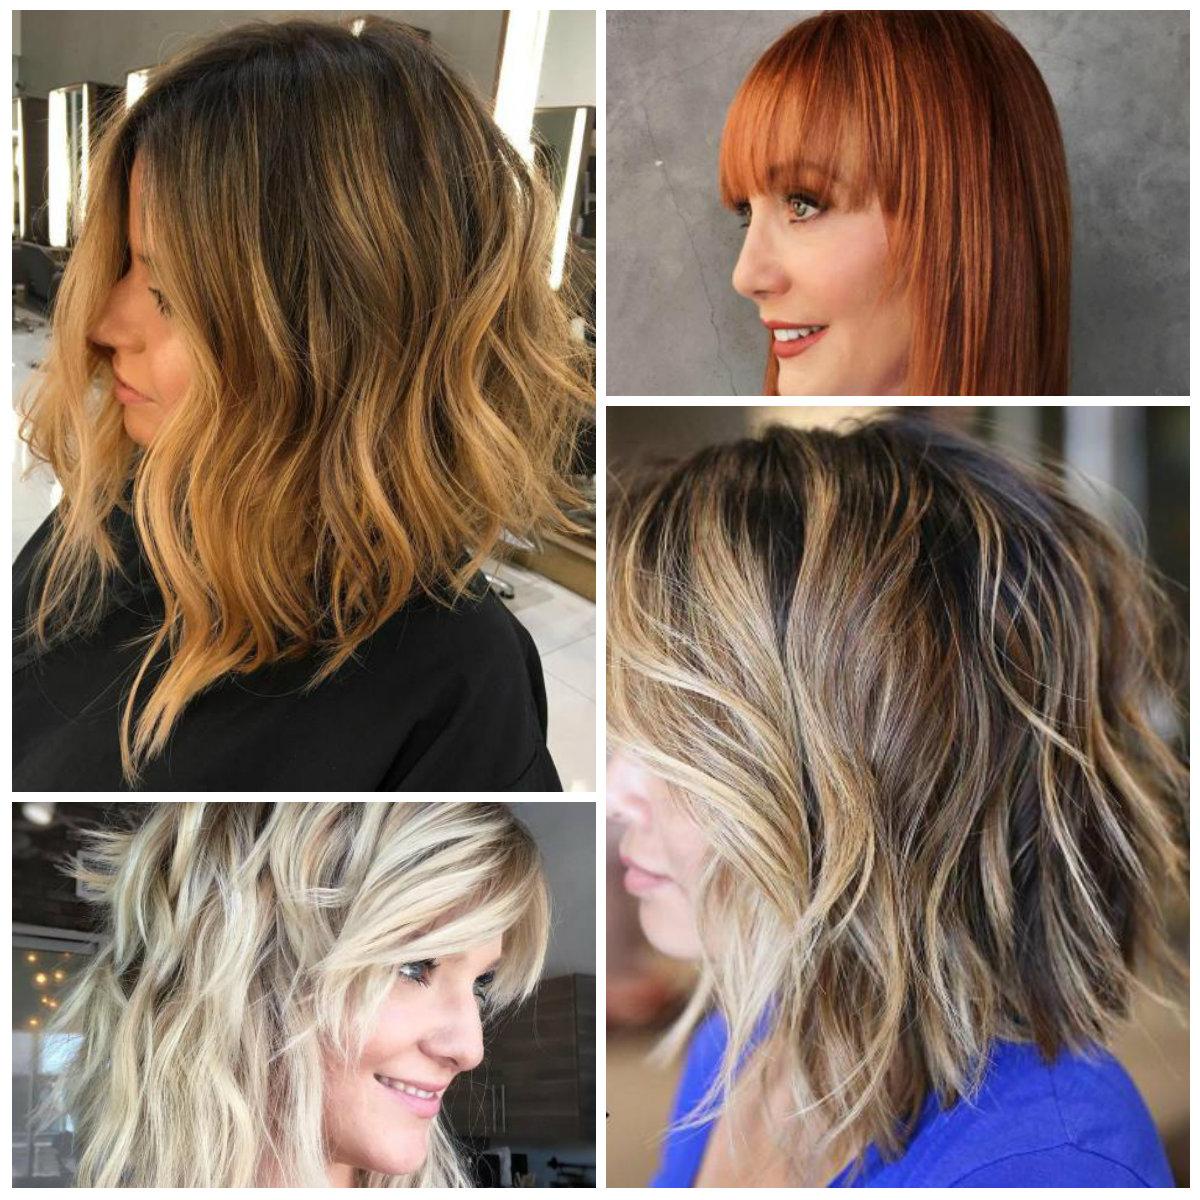 Medium Bob Hairstyles – Hairstyle For Women & Man Pertaining To Layered Platinum Bob Hairstyles (View 17 of 20)